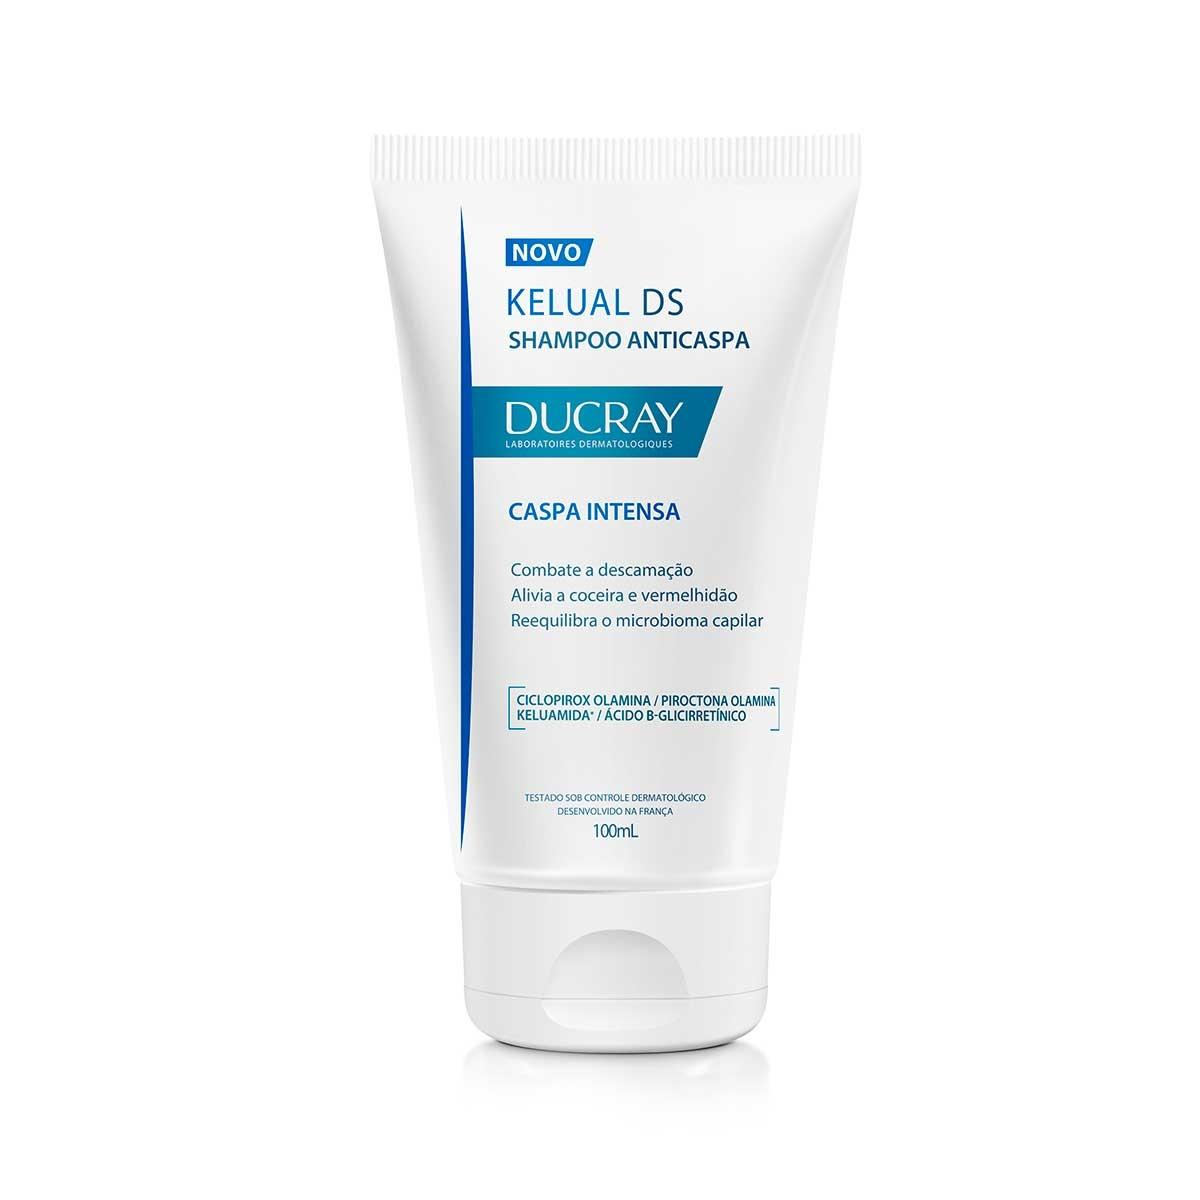 Shampoo Anticaspa Ducray Kelual DS com 100ml 100ml